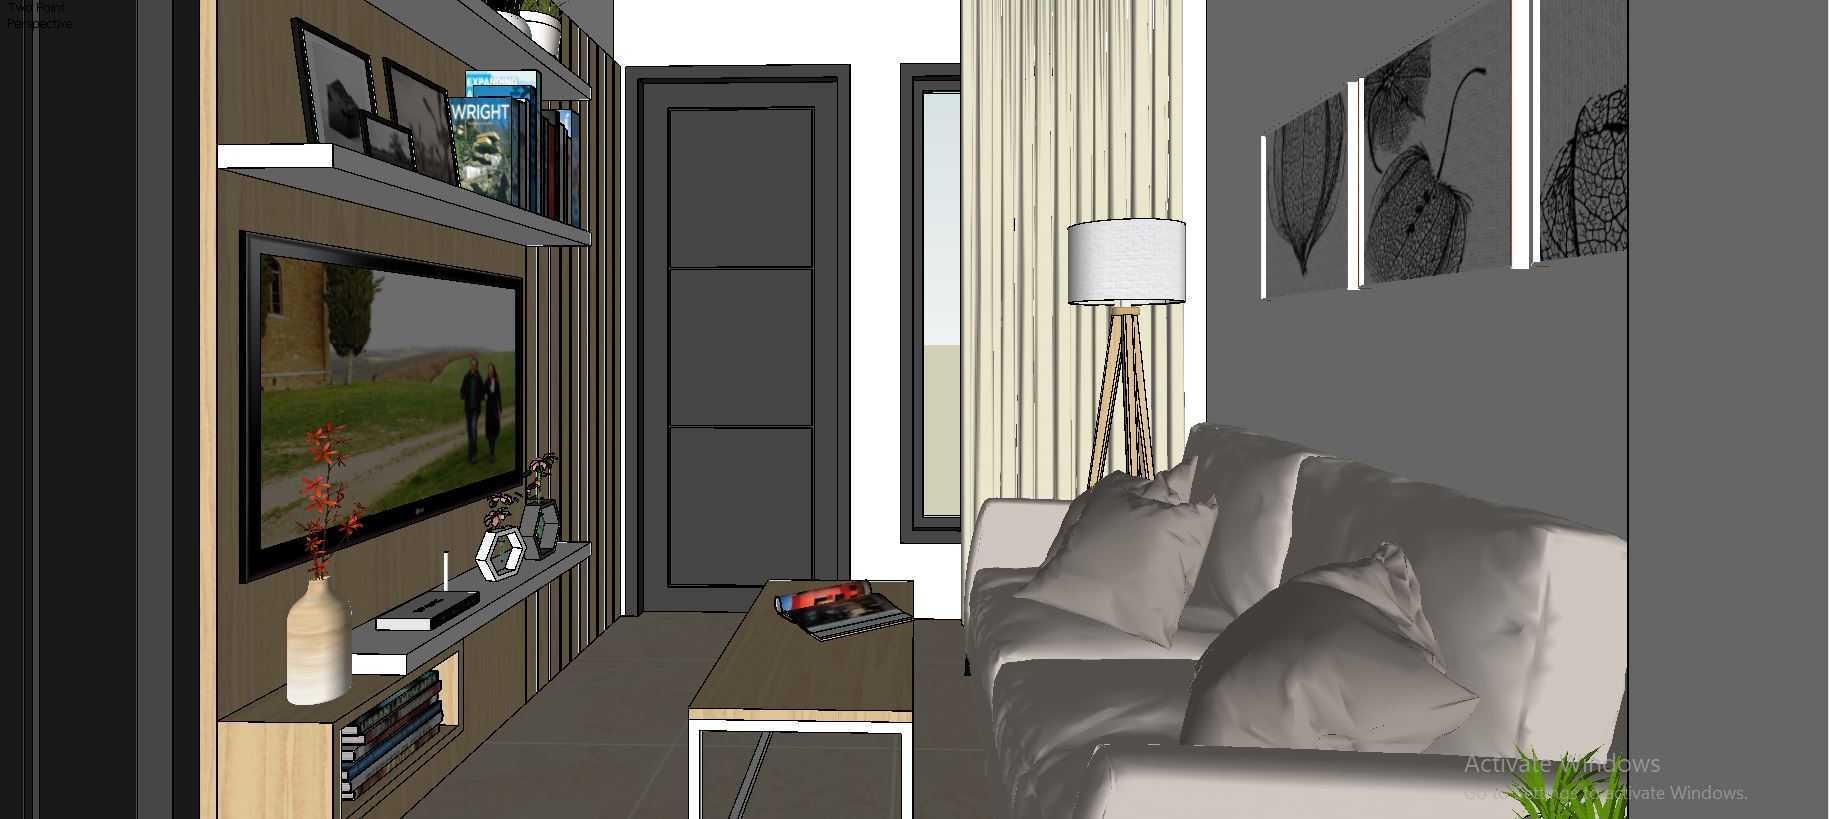 Arta Studio Billa's House Kec. Sawangan, Kota Depok, Jawa Barat, Indonesia Kec. Sawangan, Kota Depok, Jawa Barat, Indonesia Arief-Muhammad-Nasution-Billas-House  108277